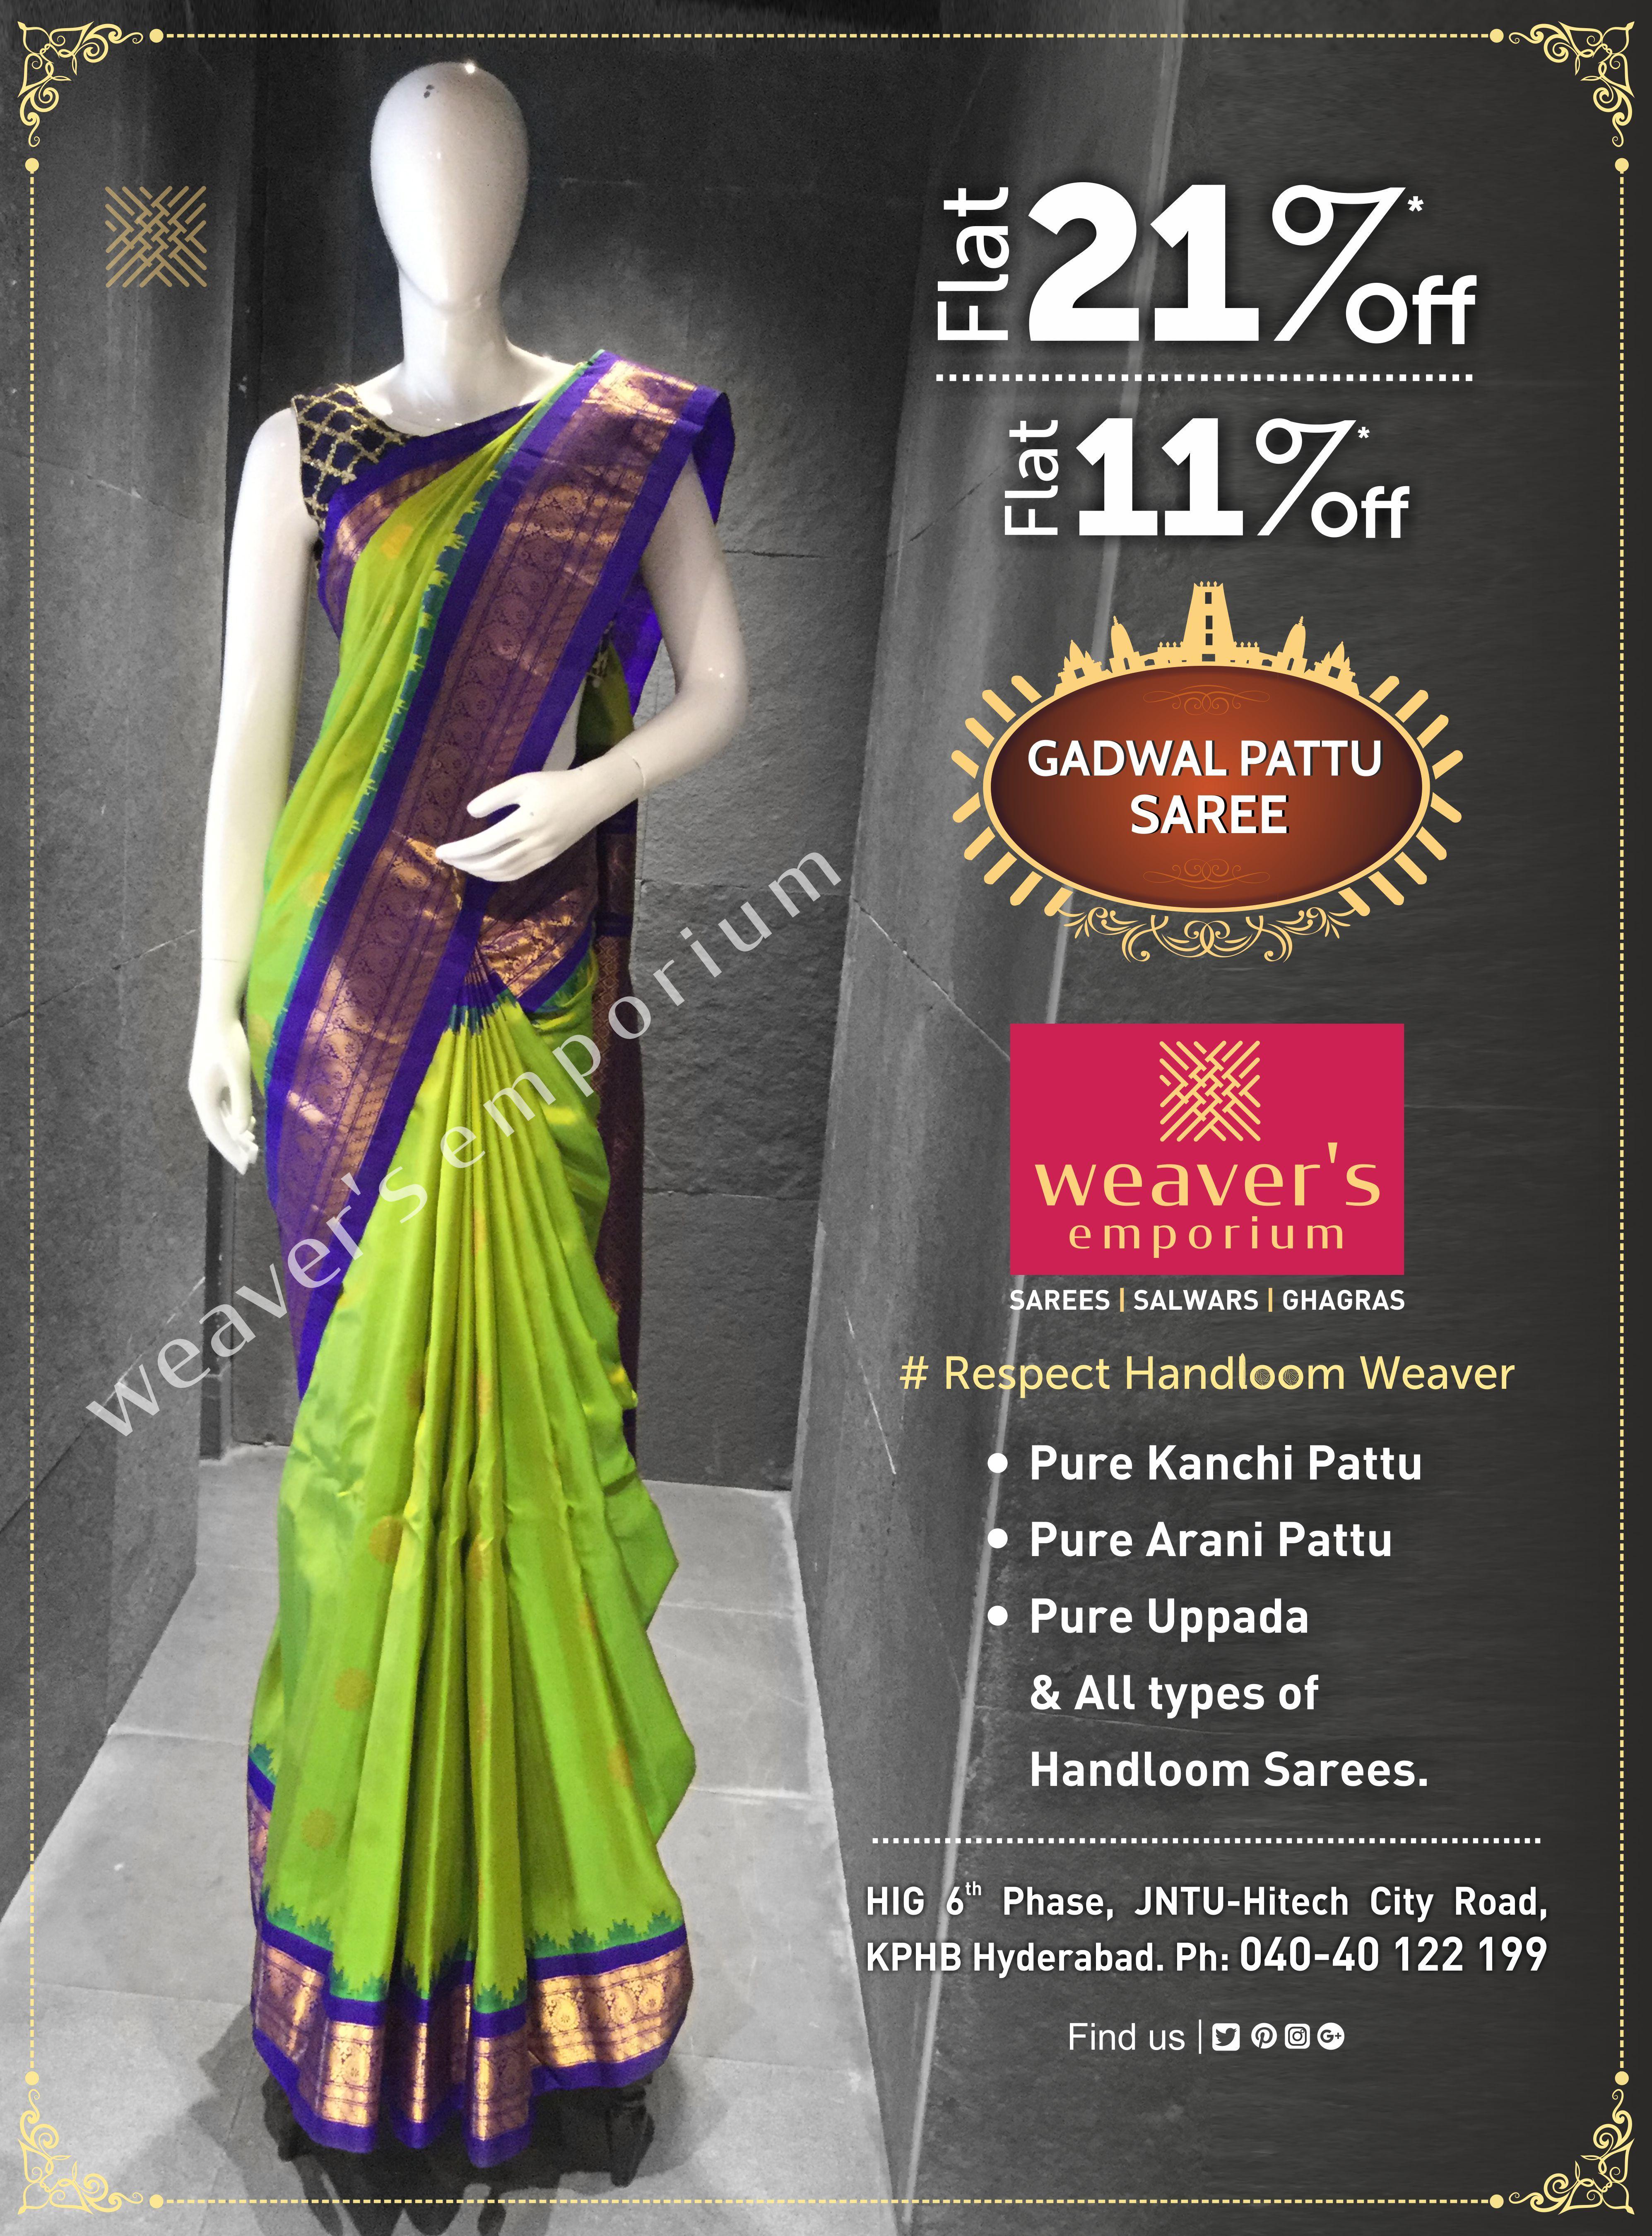 9257bffc2b Weavers Emporium Gadwal Pattu Saree   Exclusive Linen Sarees ...